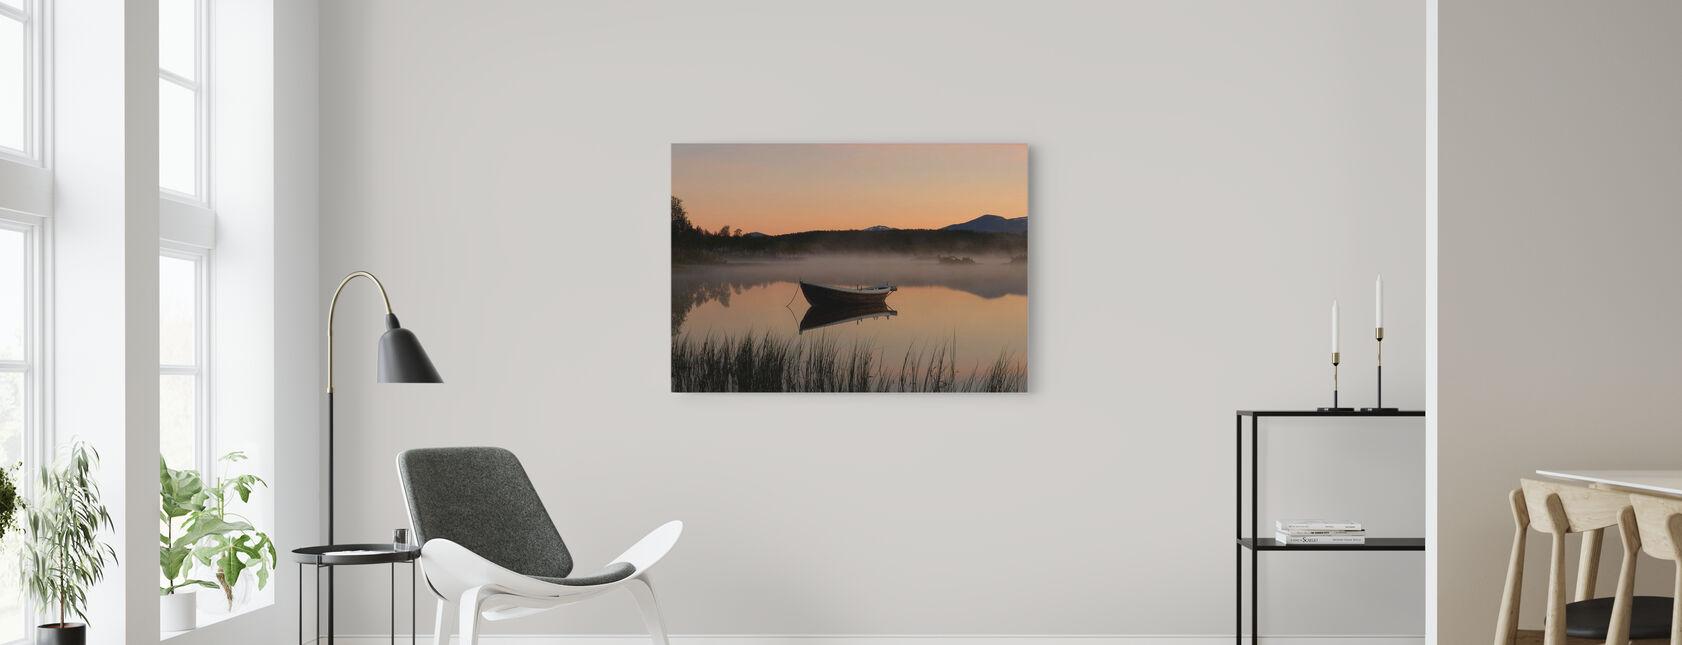 Vredige avond aan het meer, Senja Noorwegen - Canvas print - Woonkamer